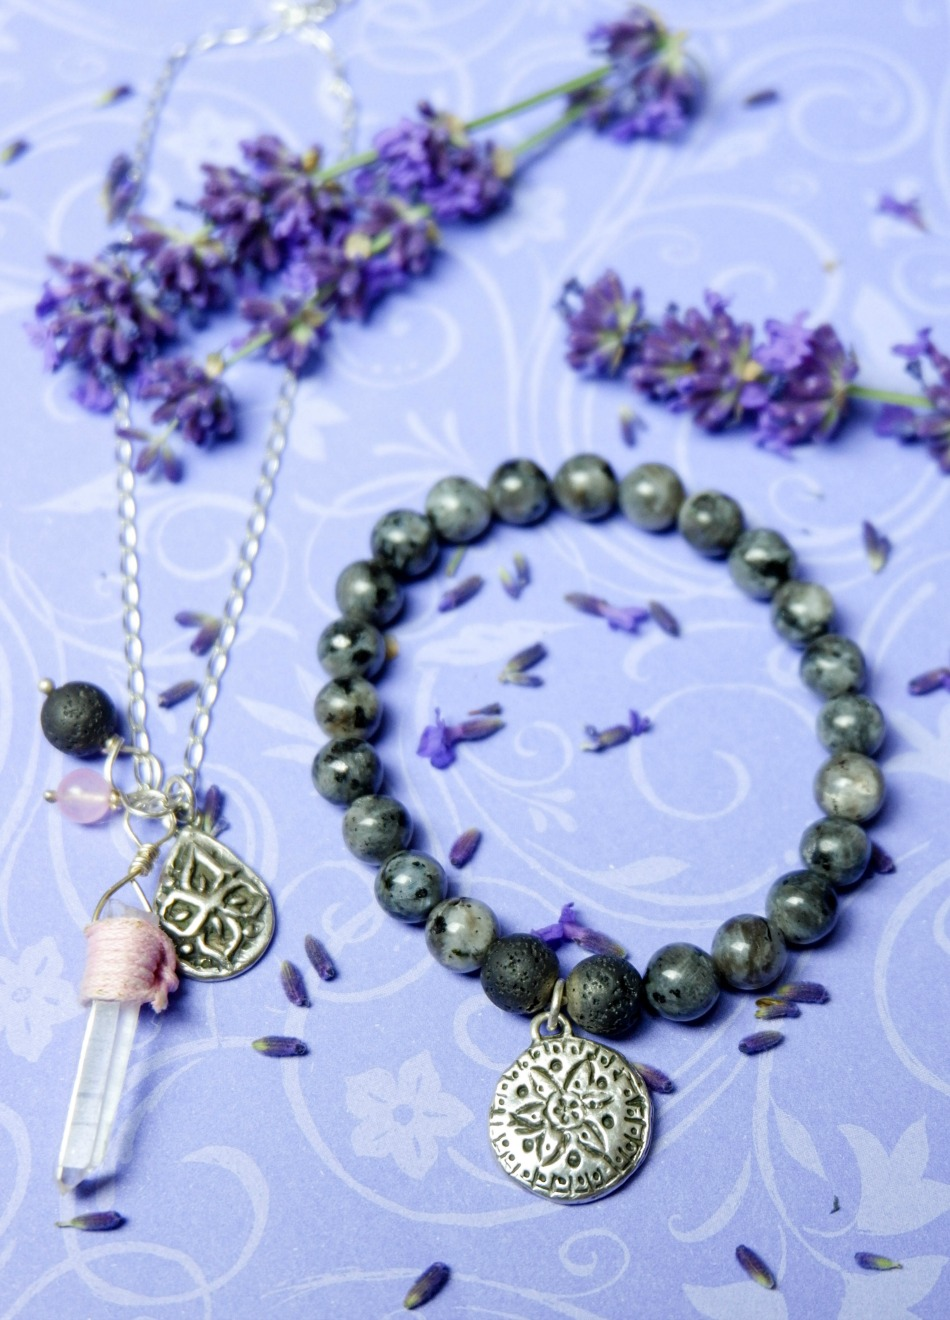 memorial jewelry Aromatherapy Essential Oils Diffuser Locket Bracelet Small Flowers